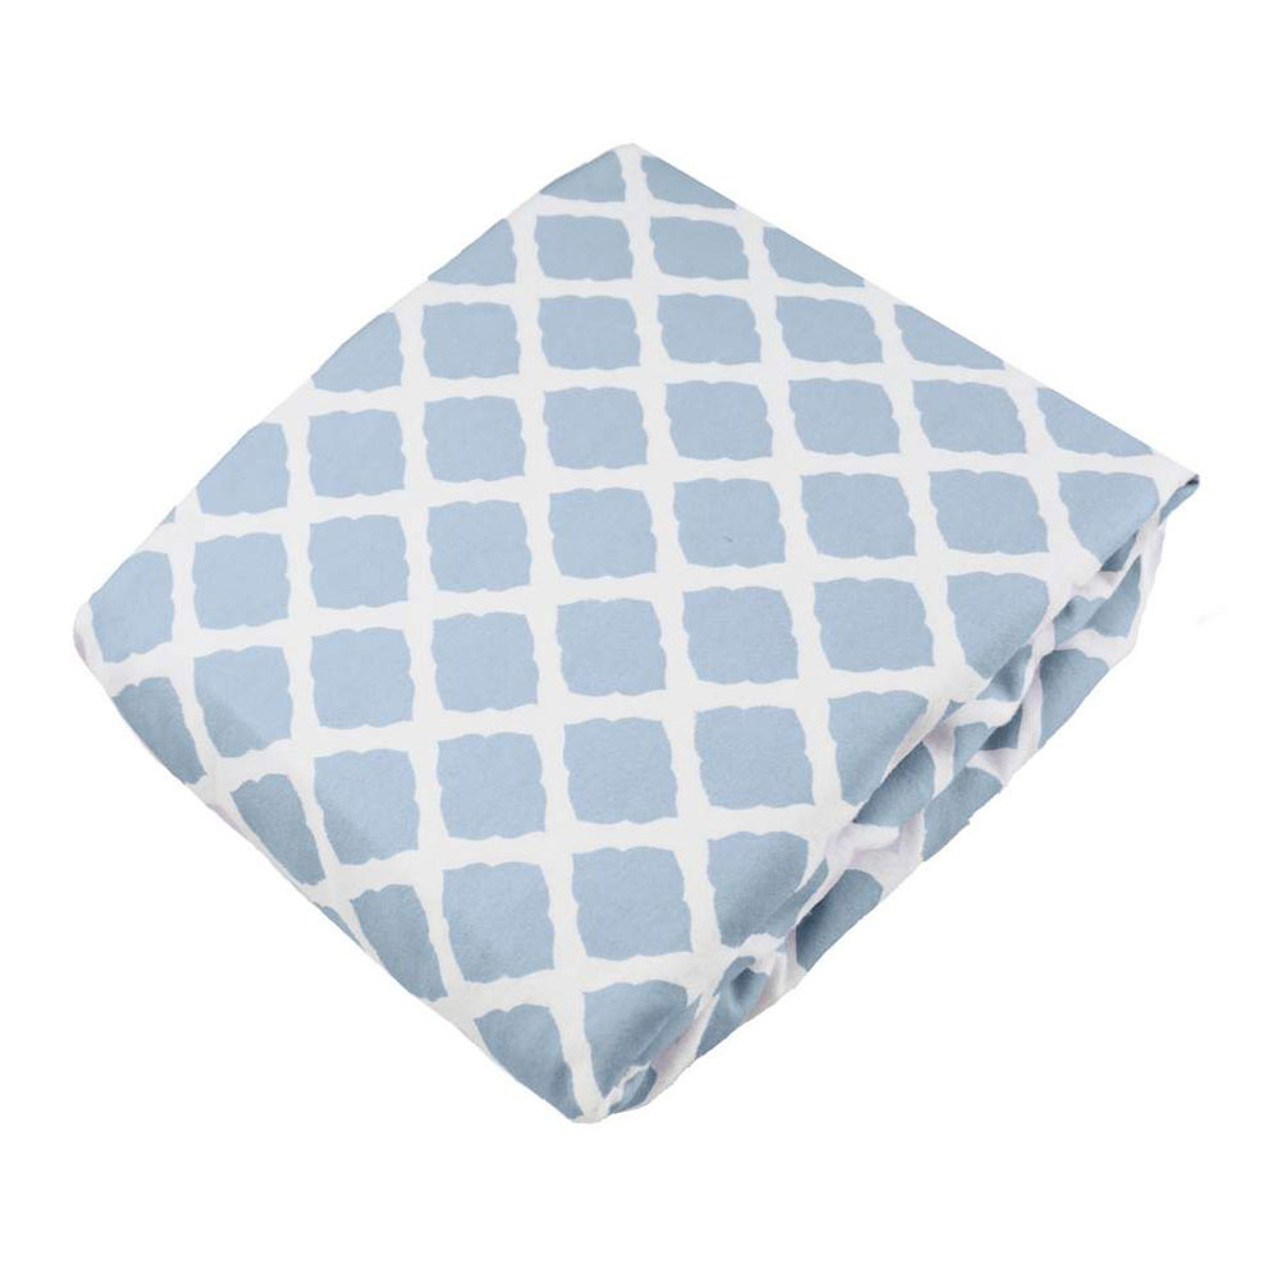 Kushies Flannel Fitted Crib Sheet Lattice Blue Dear Born Baby